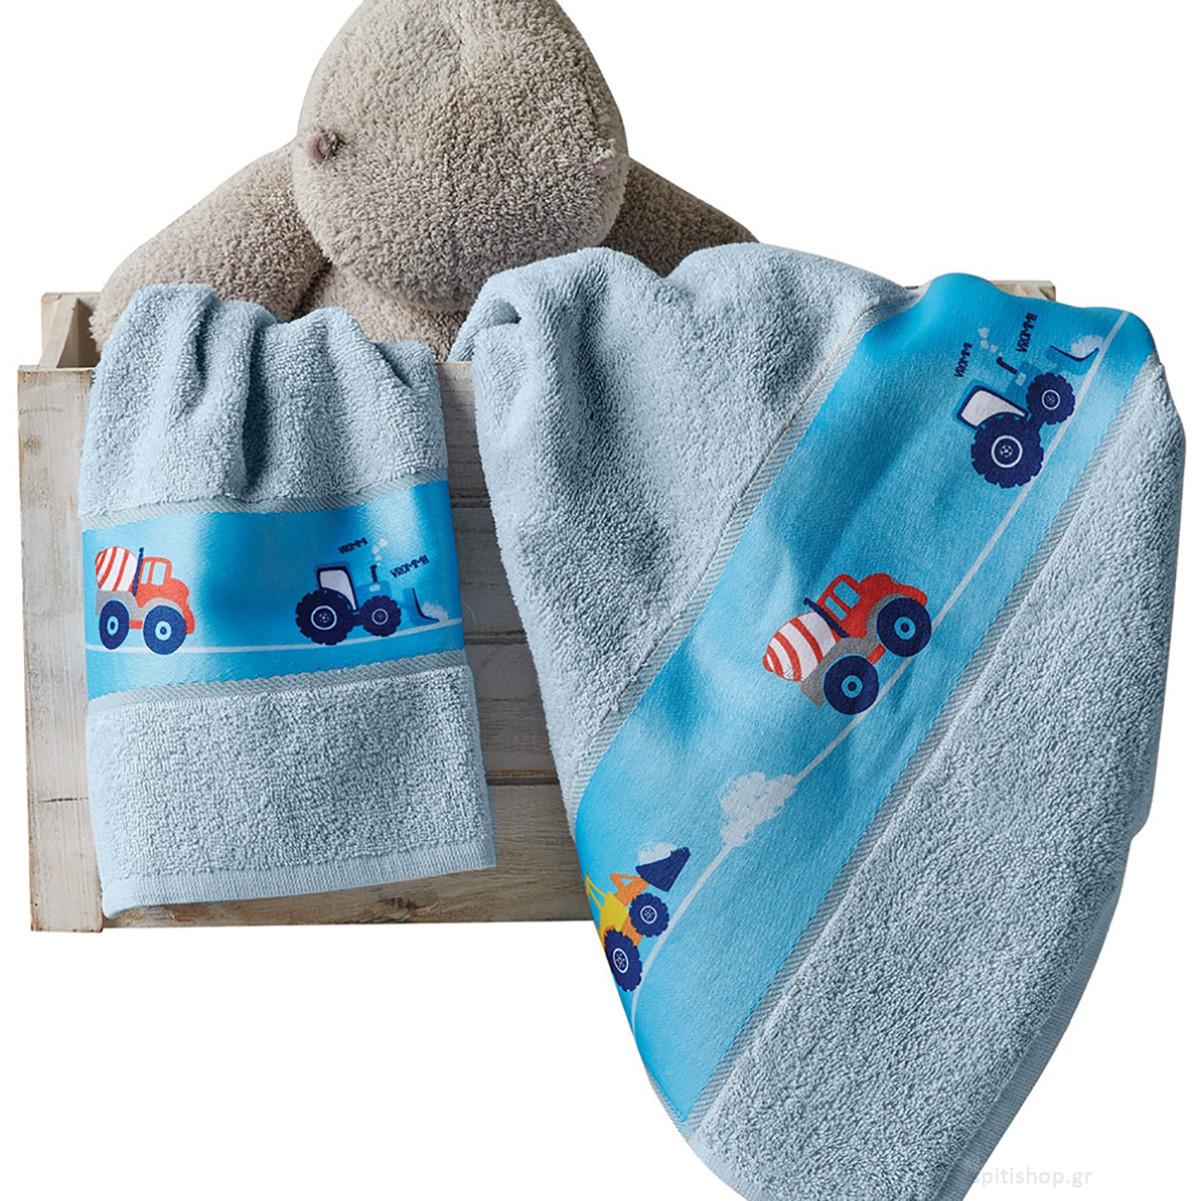 1eaef7d22f6 Παιδικές Πετσέτες (Σετ 2τμχ) Kentia Kids Pit 108882 23,00 € spitishop